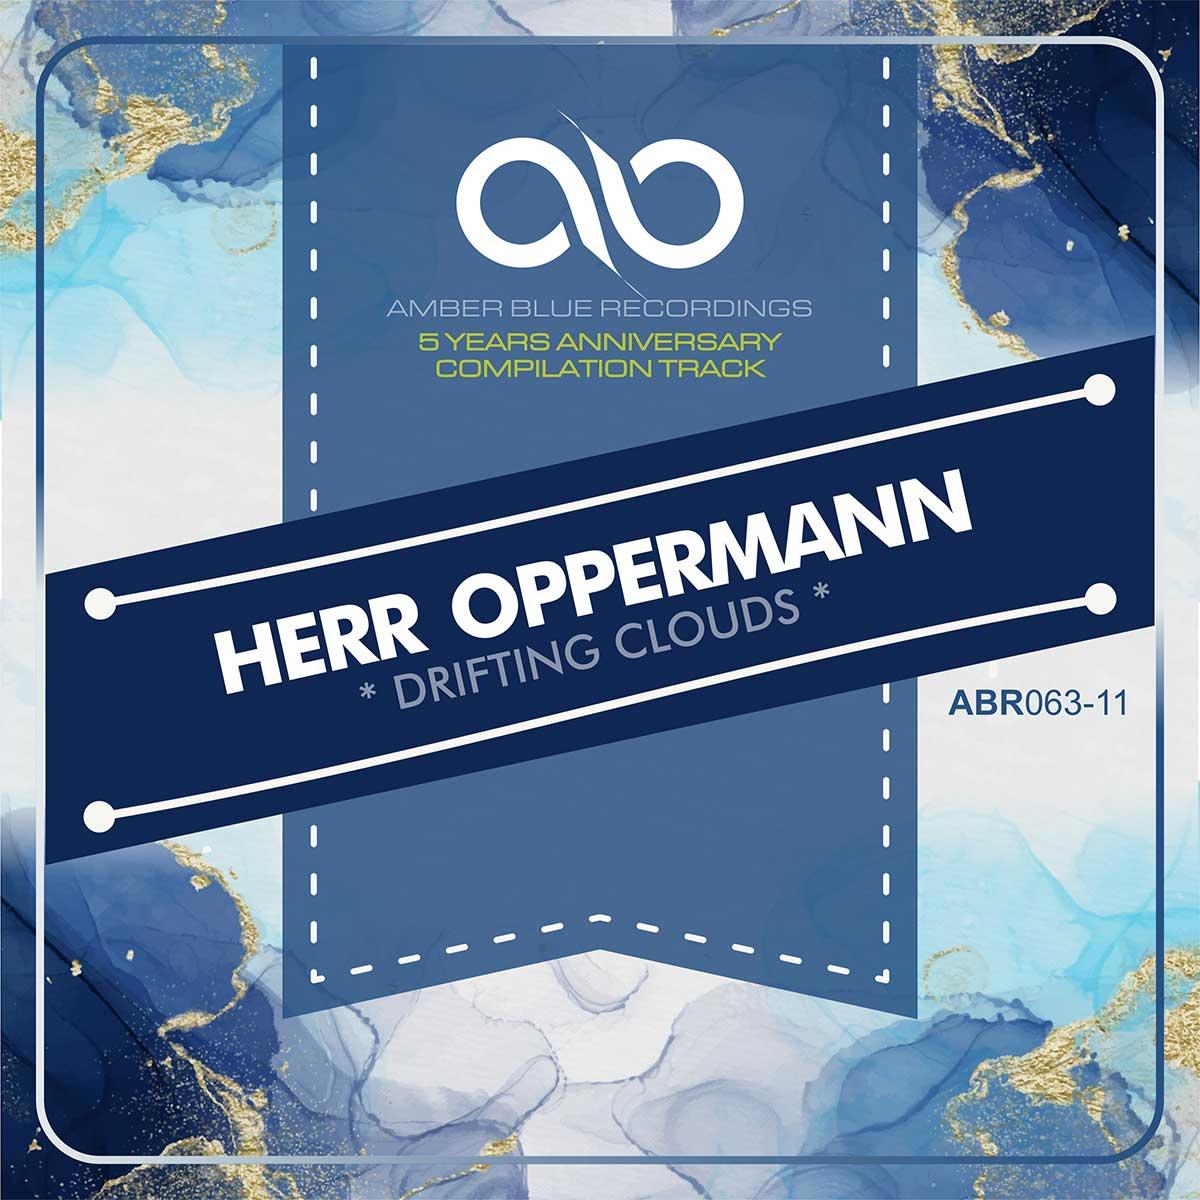 Herr Oppermann - Drifting Clouds